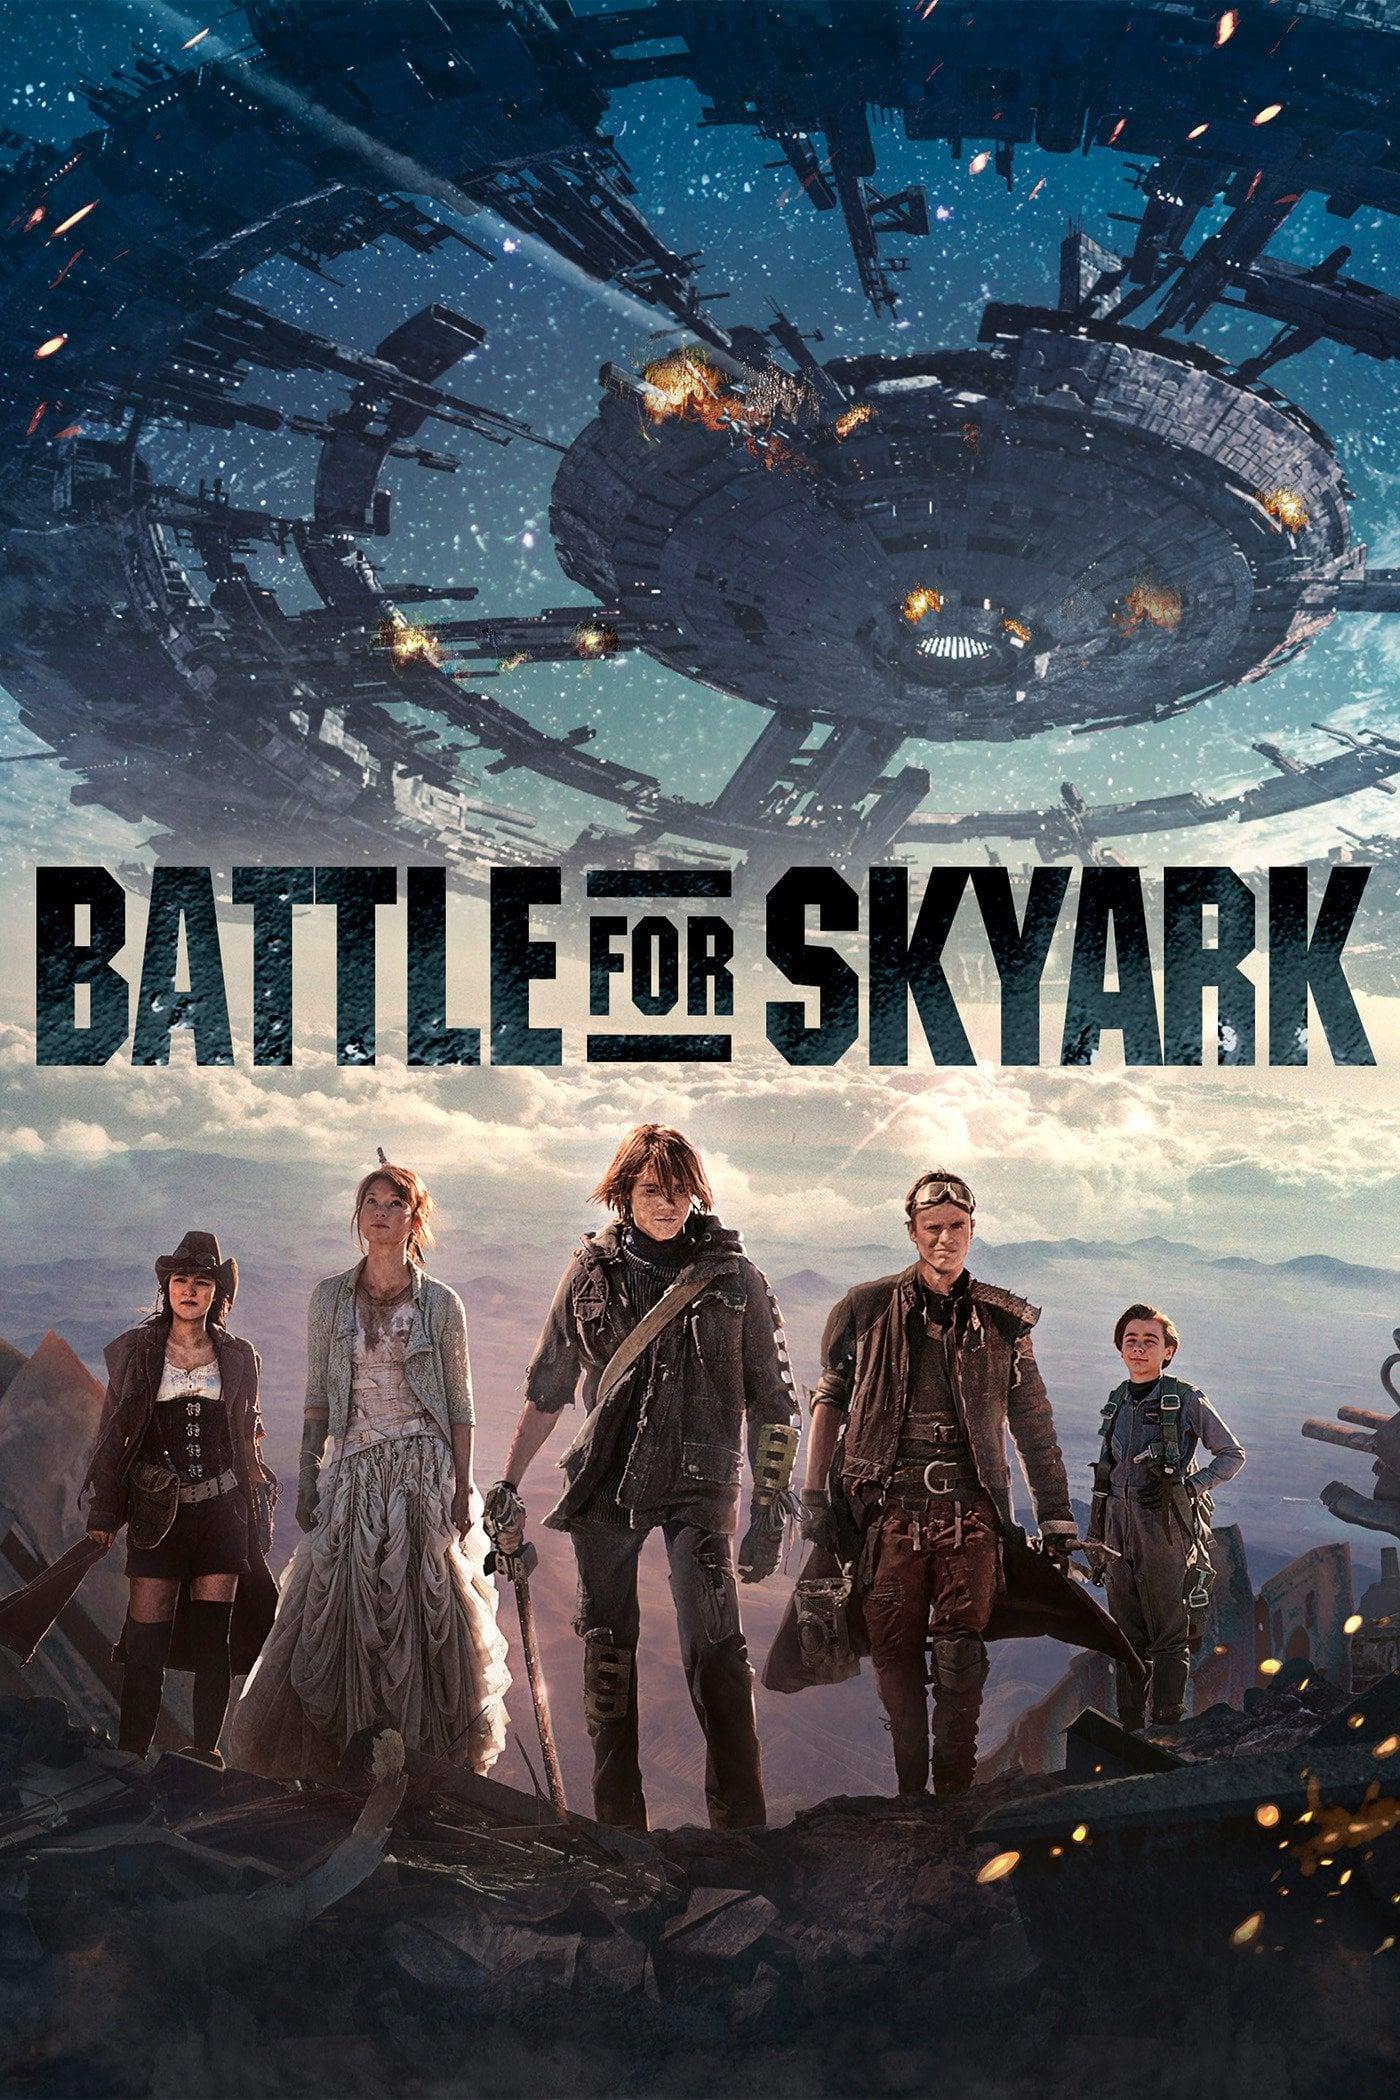 Battle for Skyark on FREECABLE TV